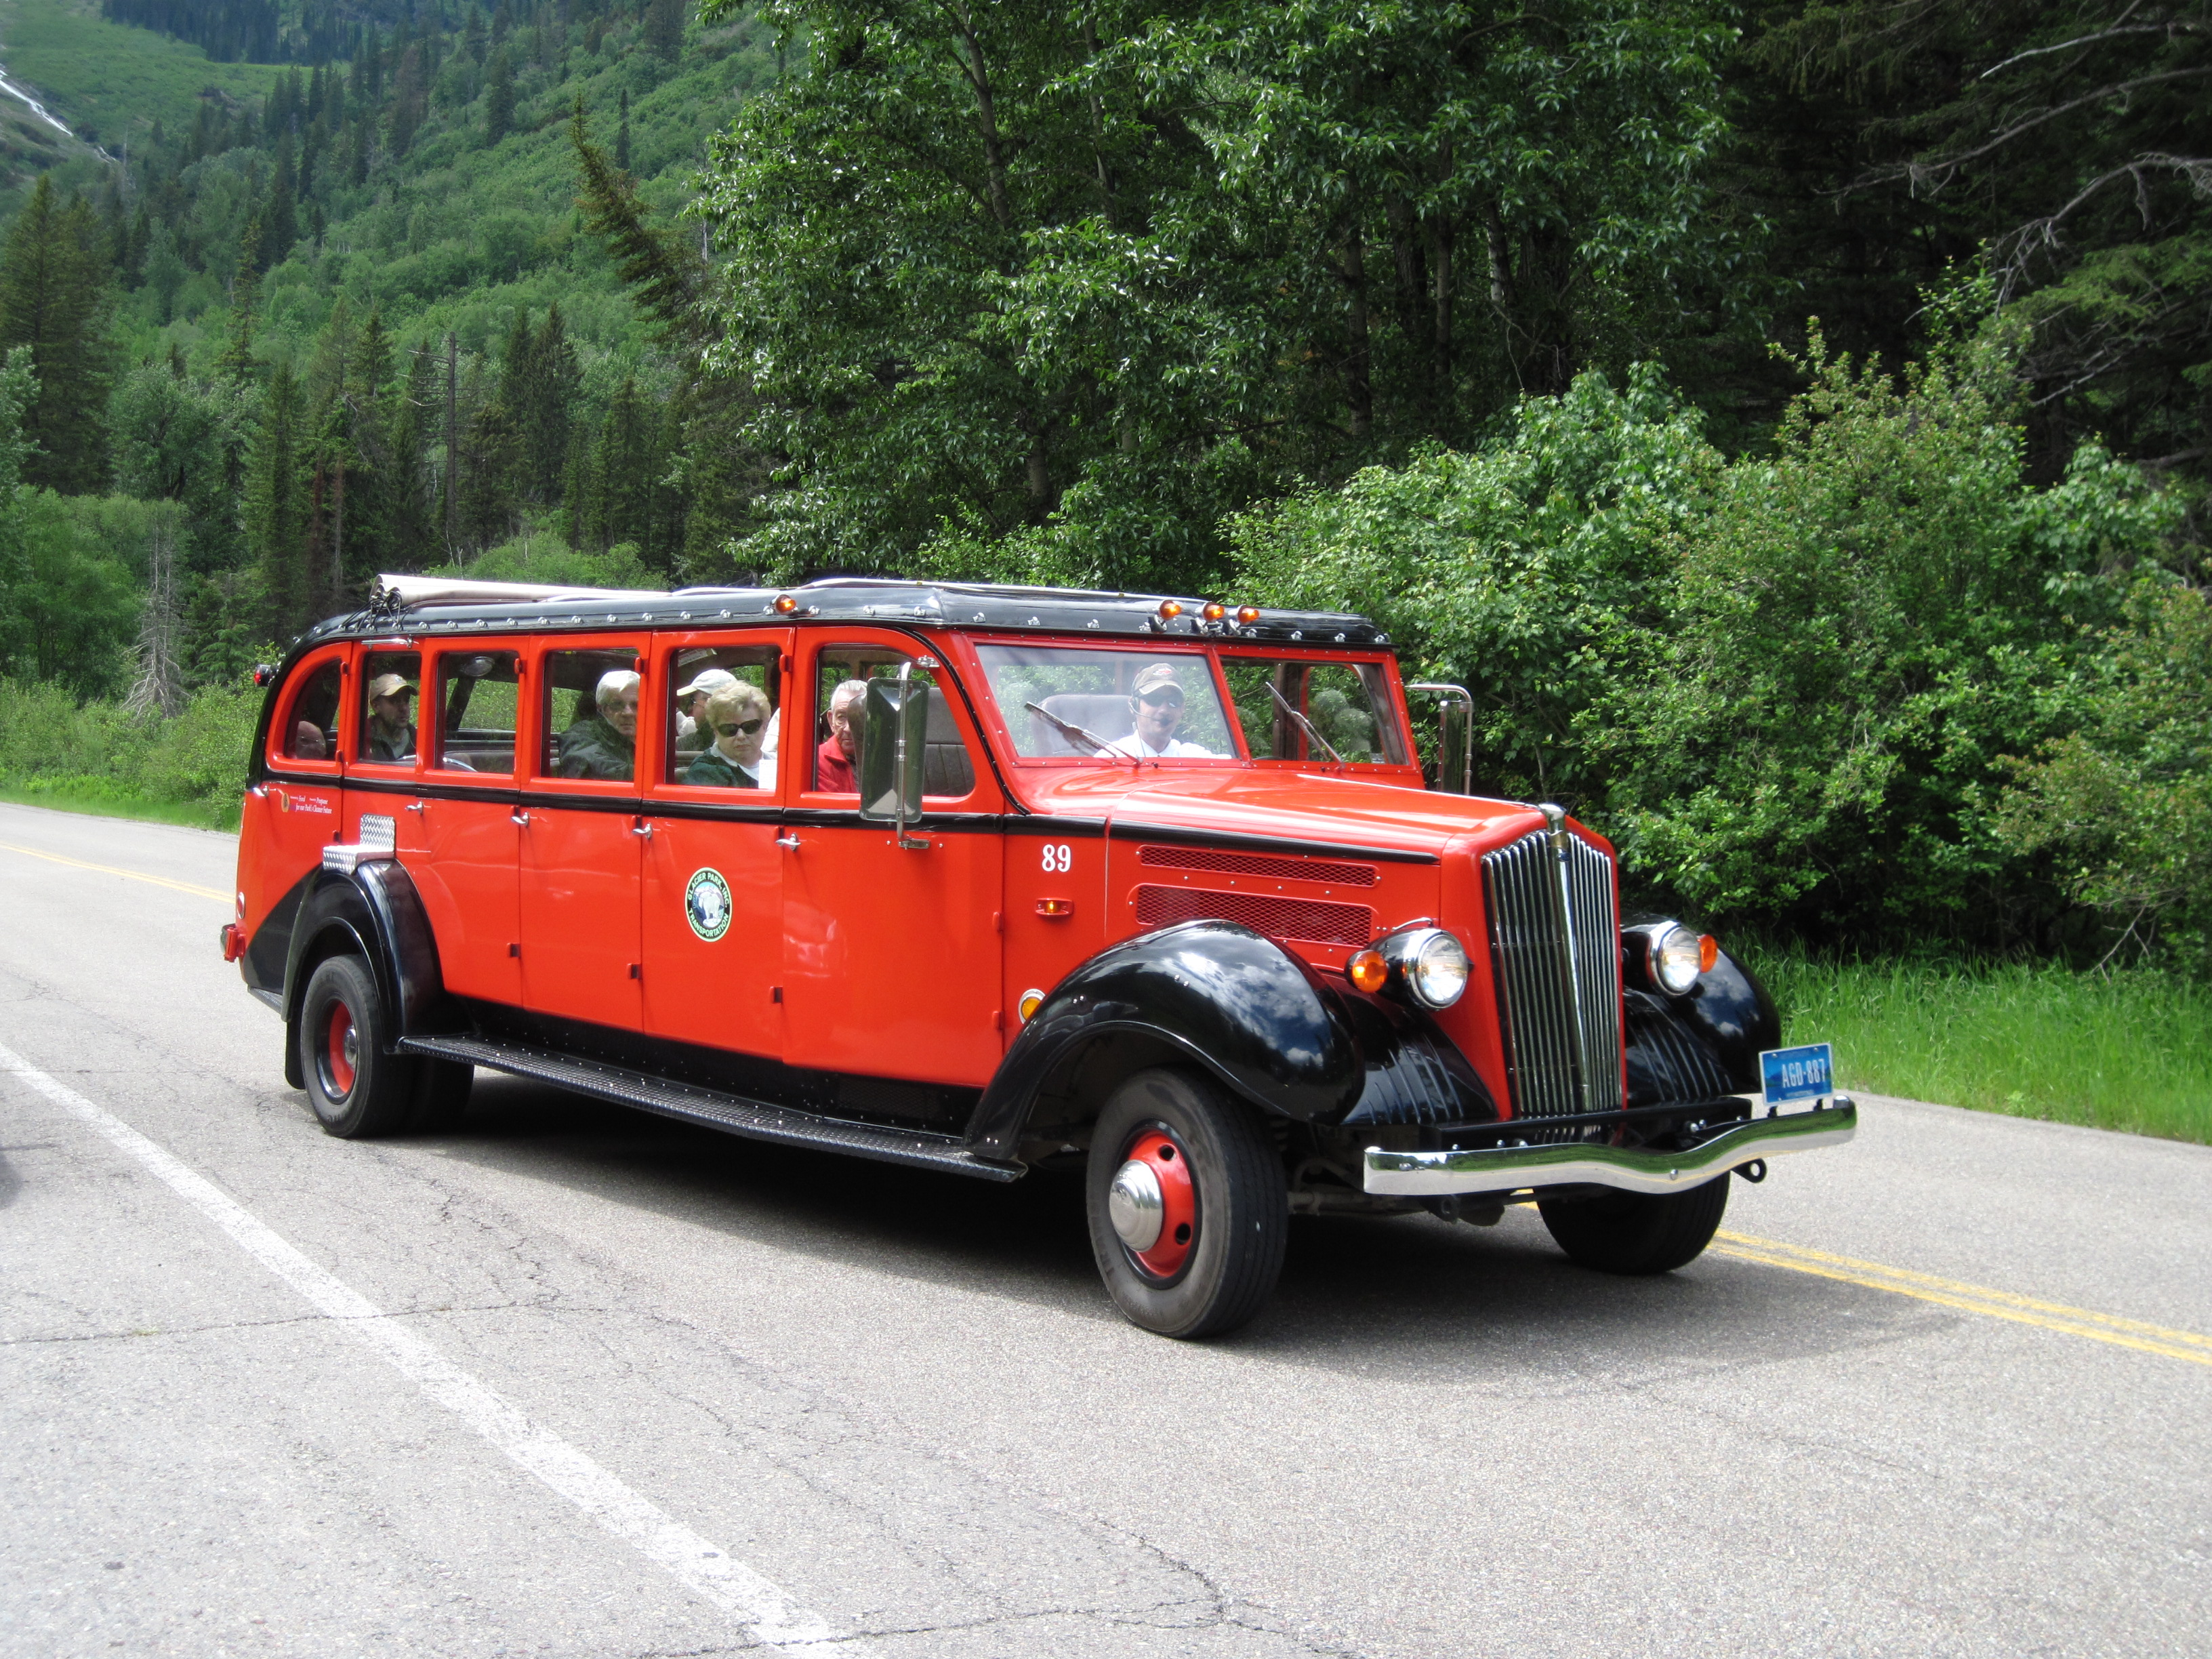 Glacier National Park visitors enjoy a ride in a vintage 1930s-era bus, Glacier National Park, Montana, June 21, 2009 | Photo courtesy Melanie Walden, St. George News